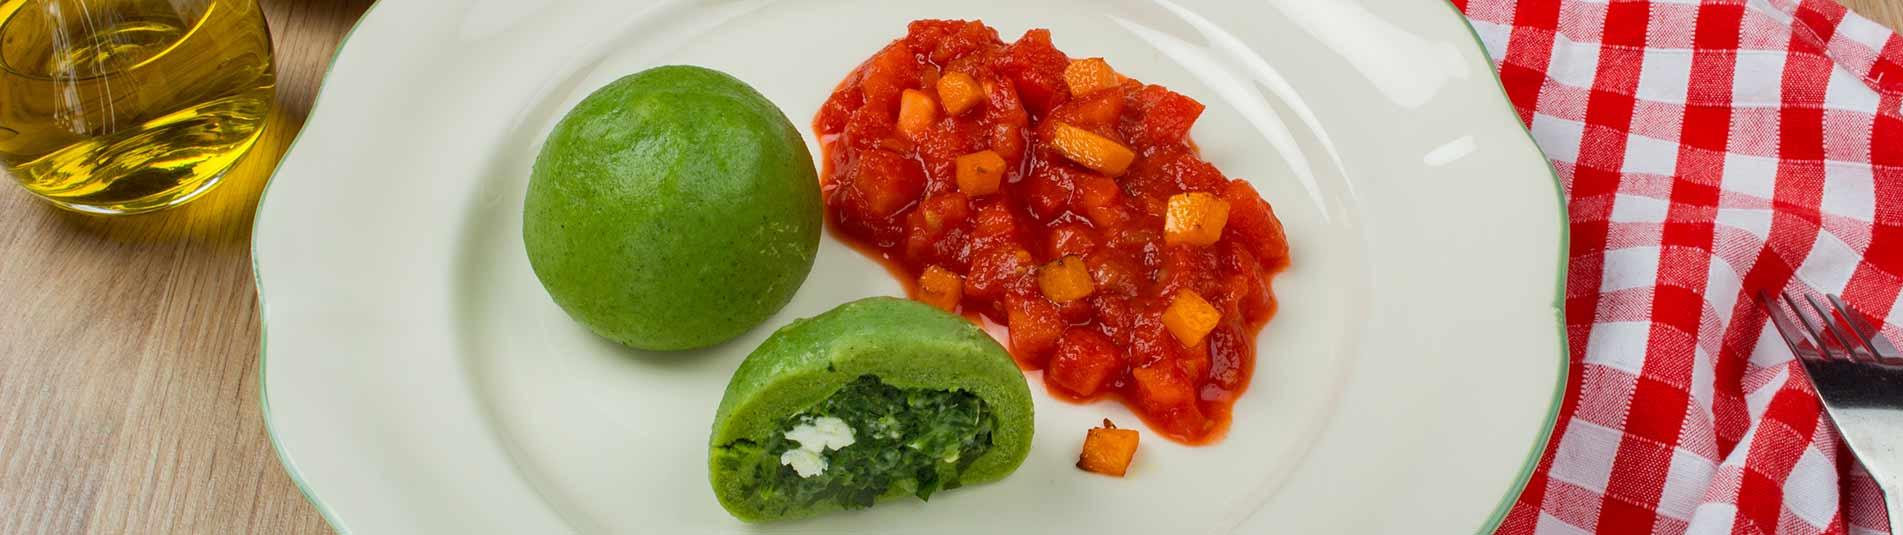 Iglo Spinat Feta Knödel auf Tomaten Kürbisragout